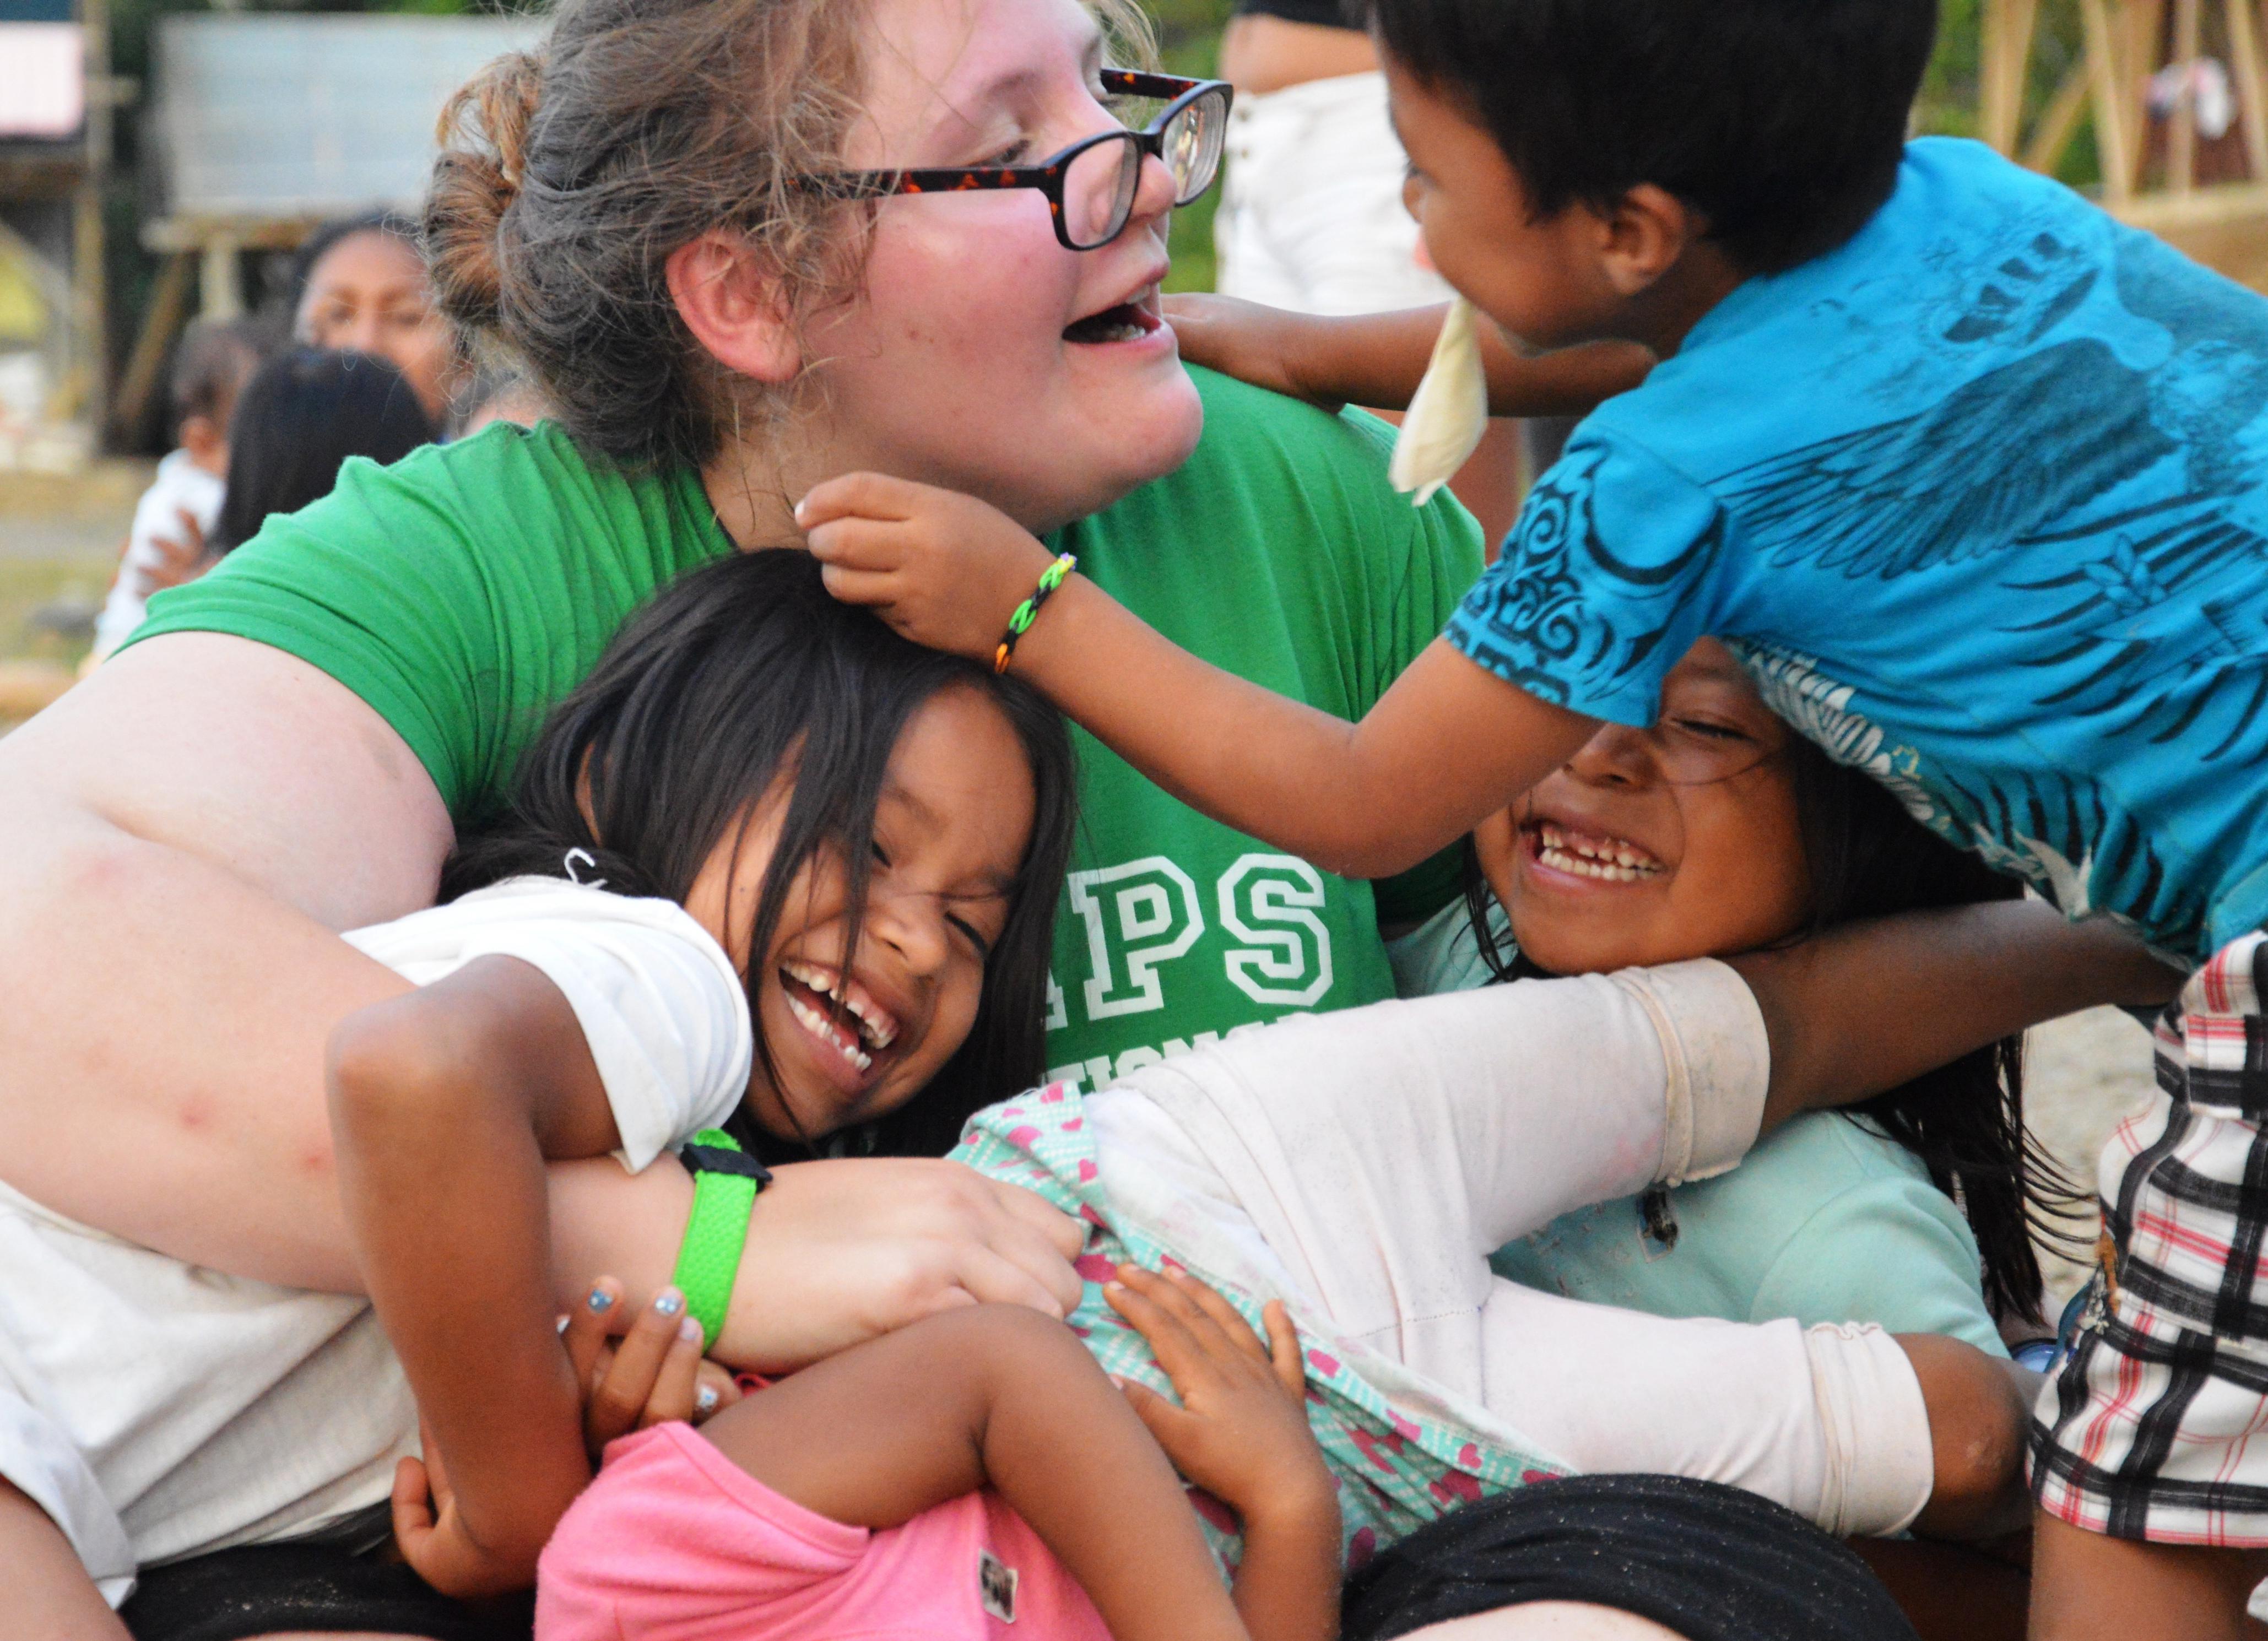 jess-the-angel-a-photo-in-ecuador-from-hettes-prize-winning-portfolio.jpg